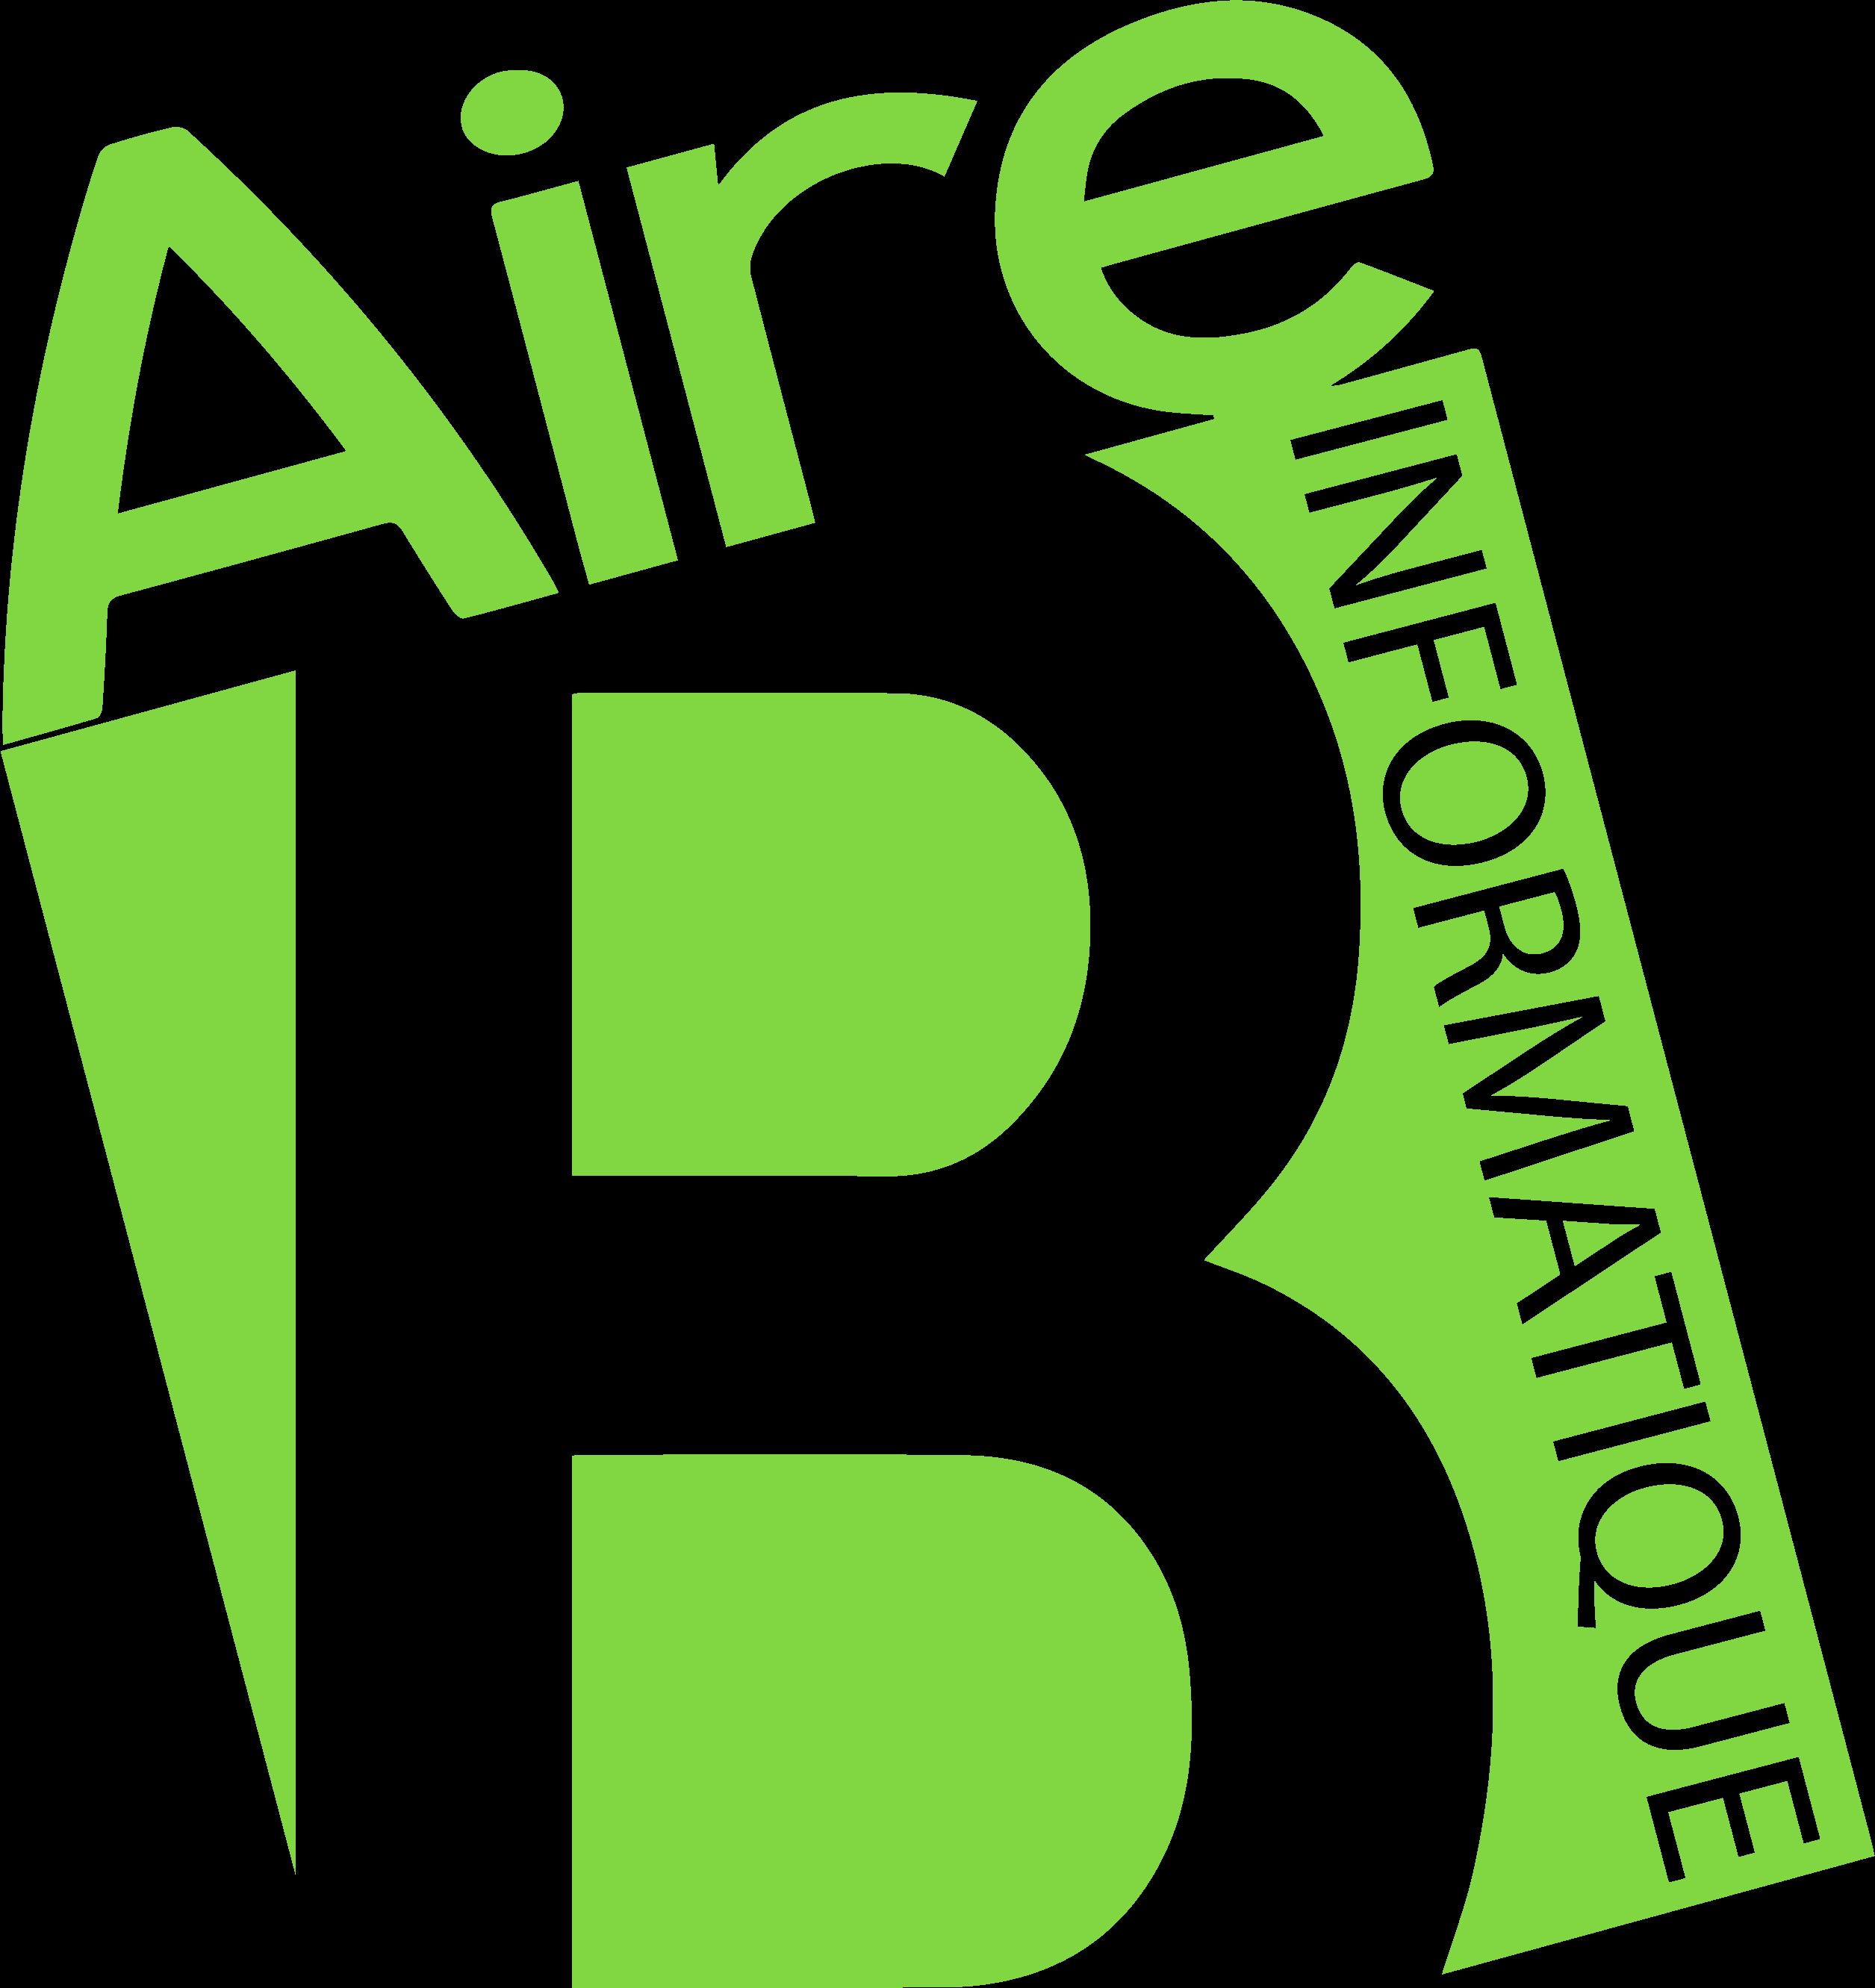 logo vert fond transparent + informatique